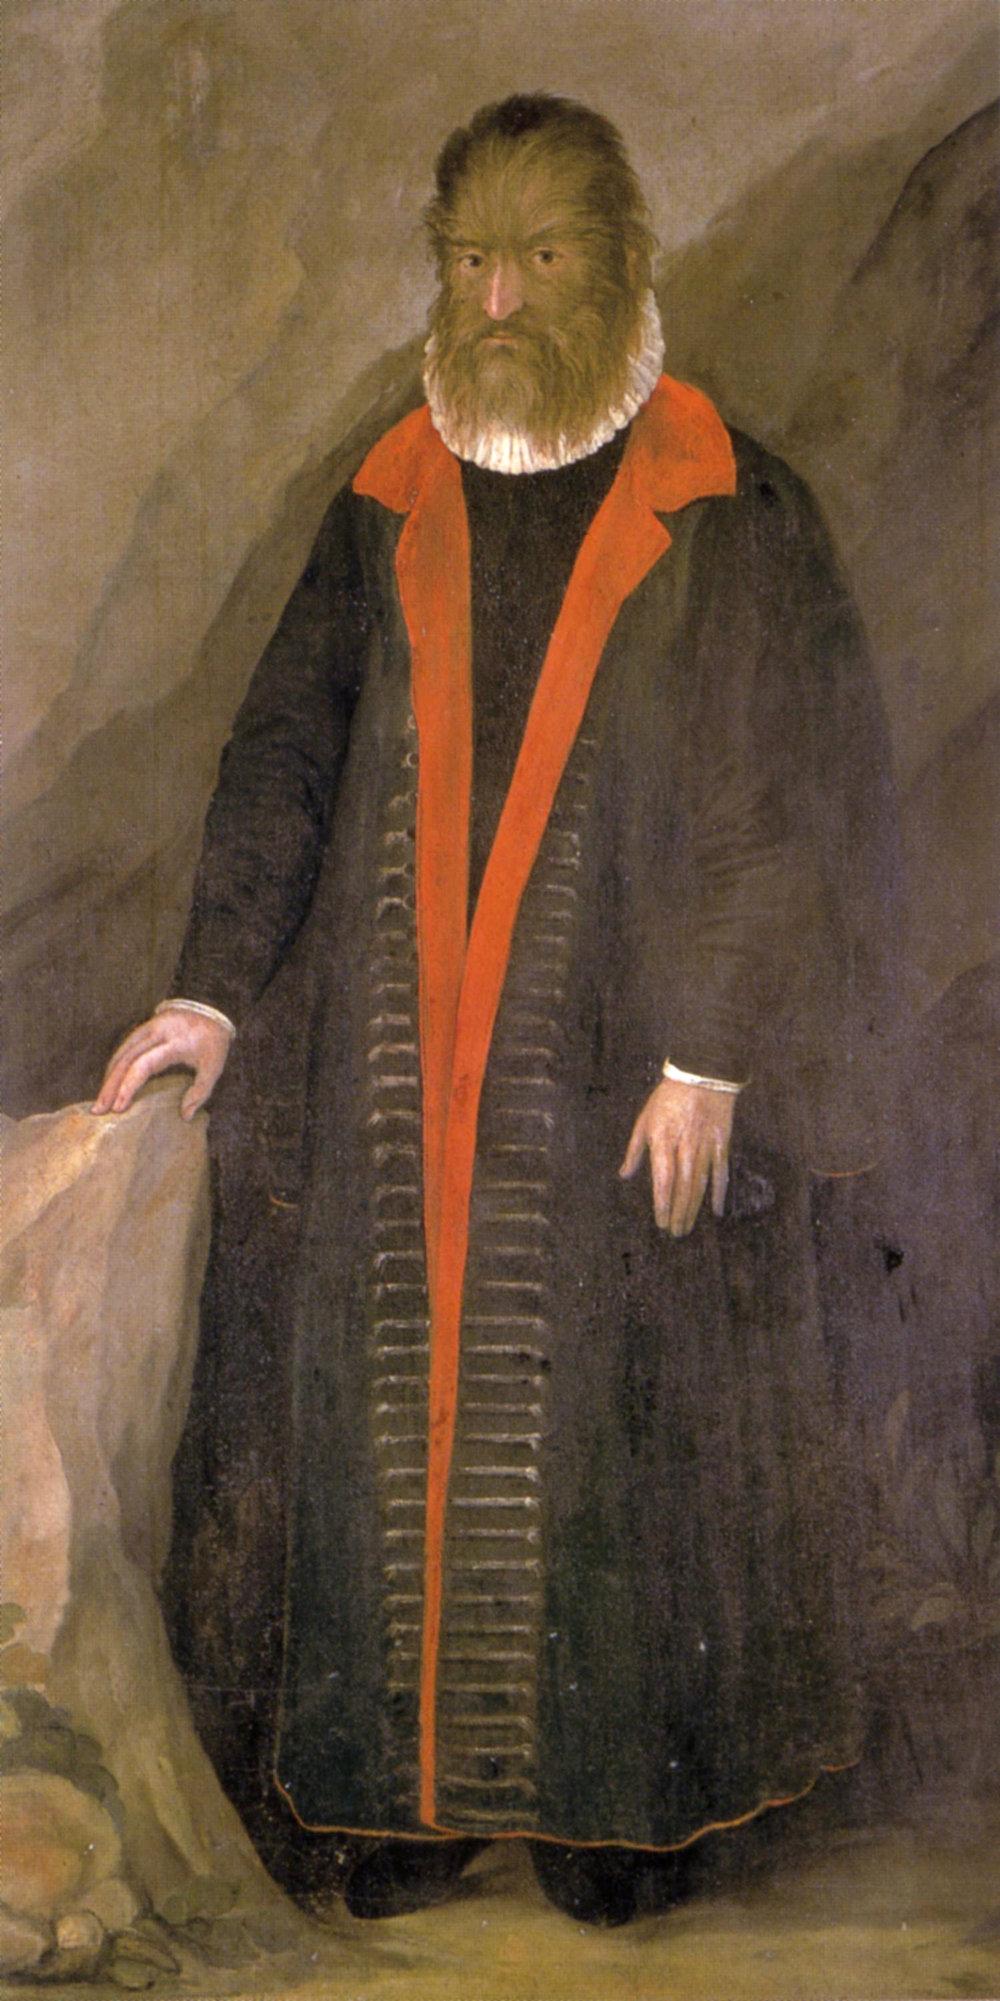 В 16 веке при дворе французского монарха Генриха II жил Петрус Гонсалвус. Он родился на острове Тенерифе